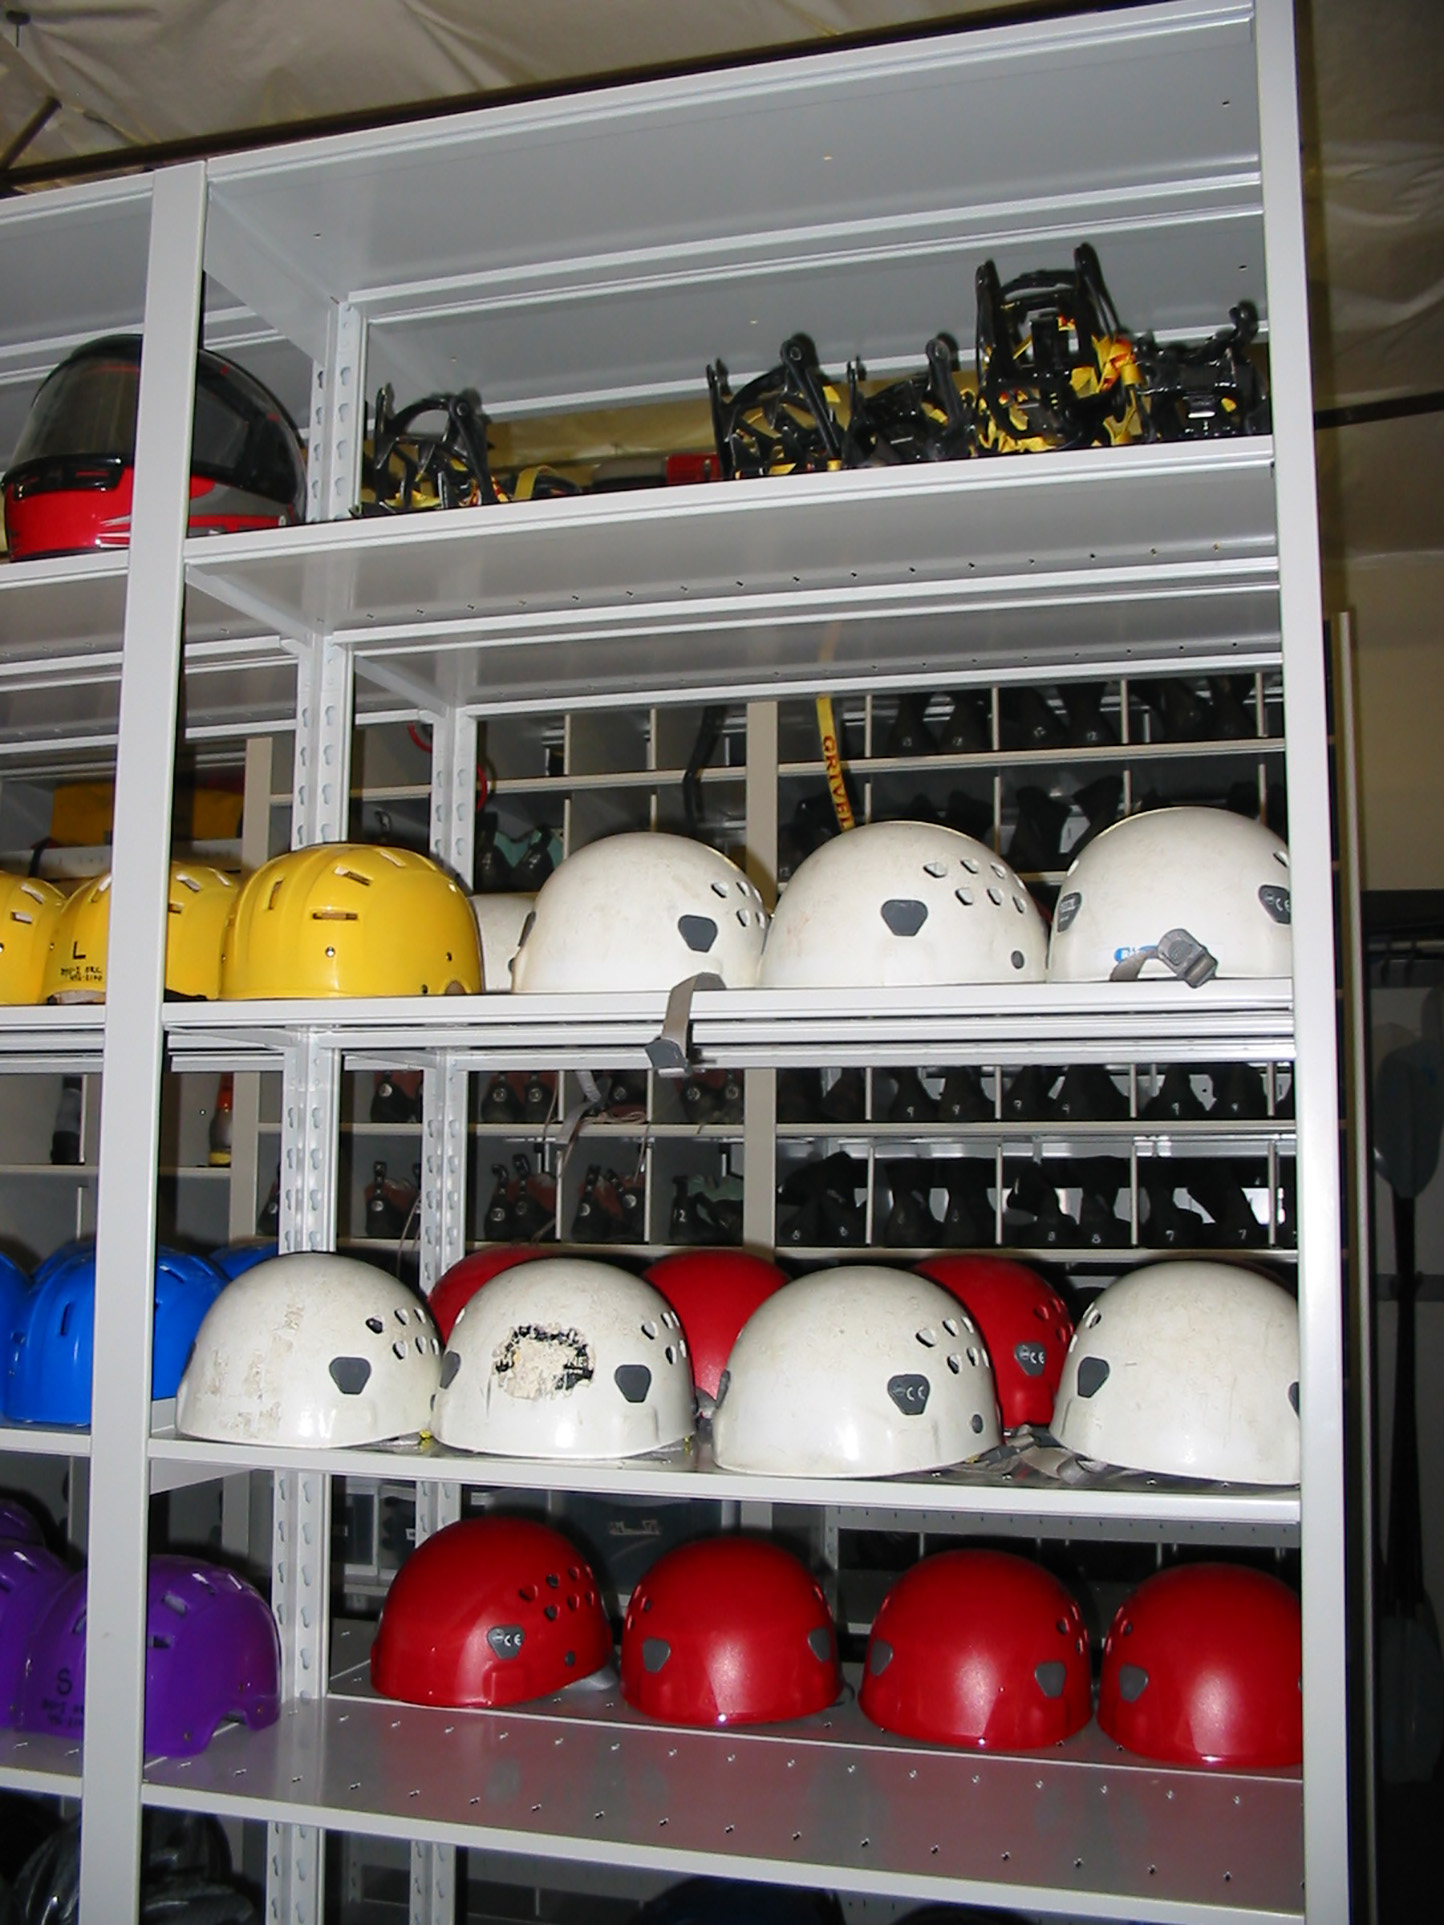 Helmet storage on shelves at Outdoor Resource Center on Brigham University Campus